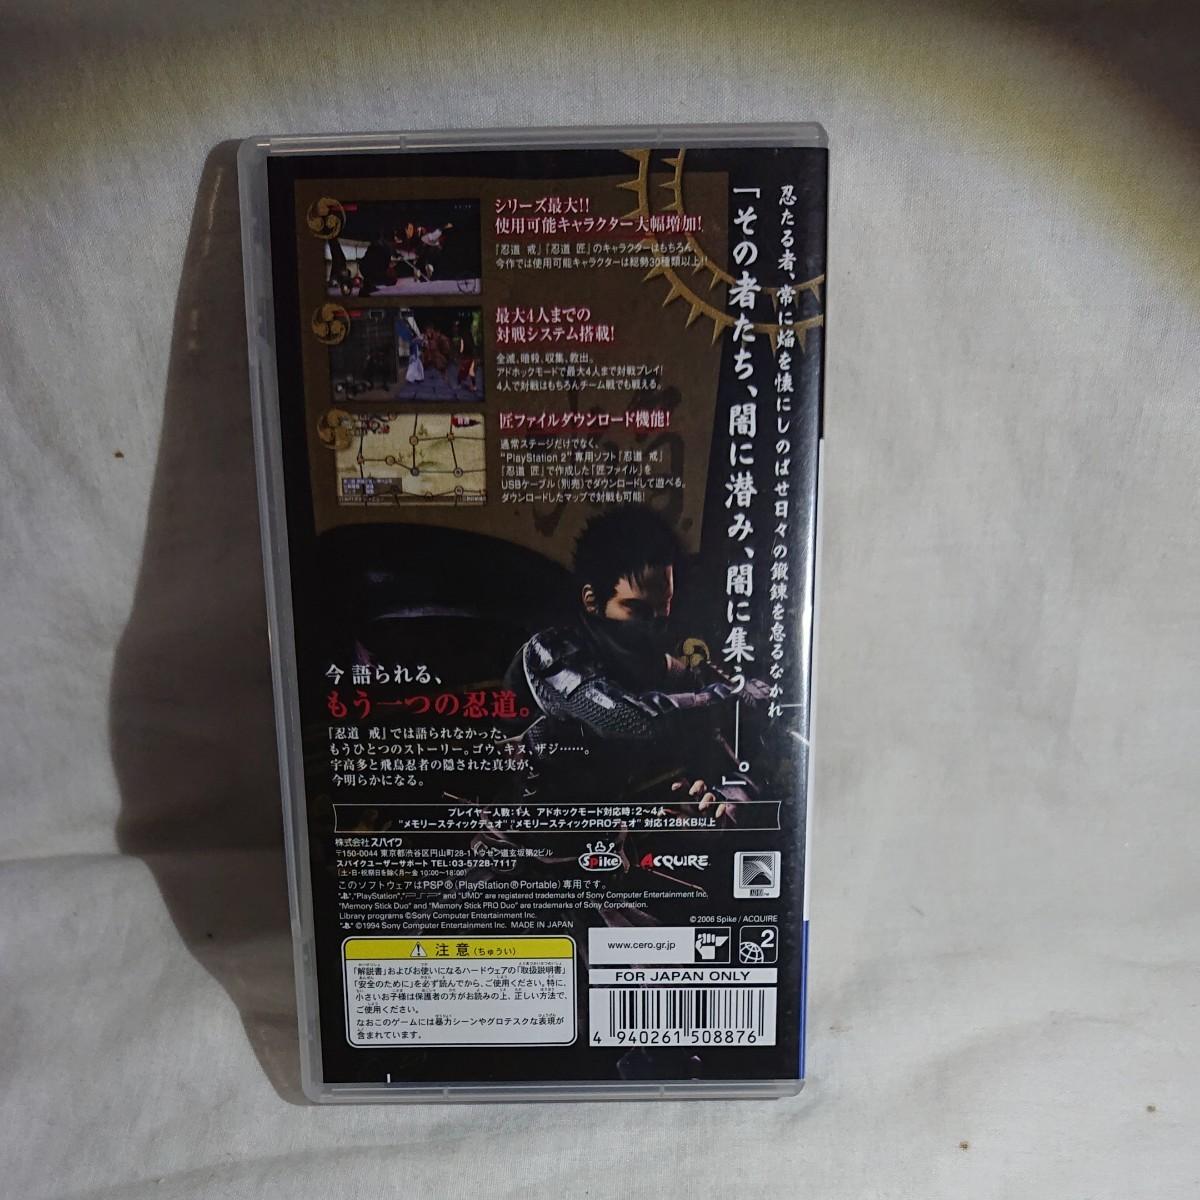 PSP 忍道 焔 動作確認済み PSP